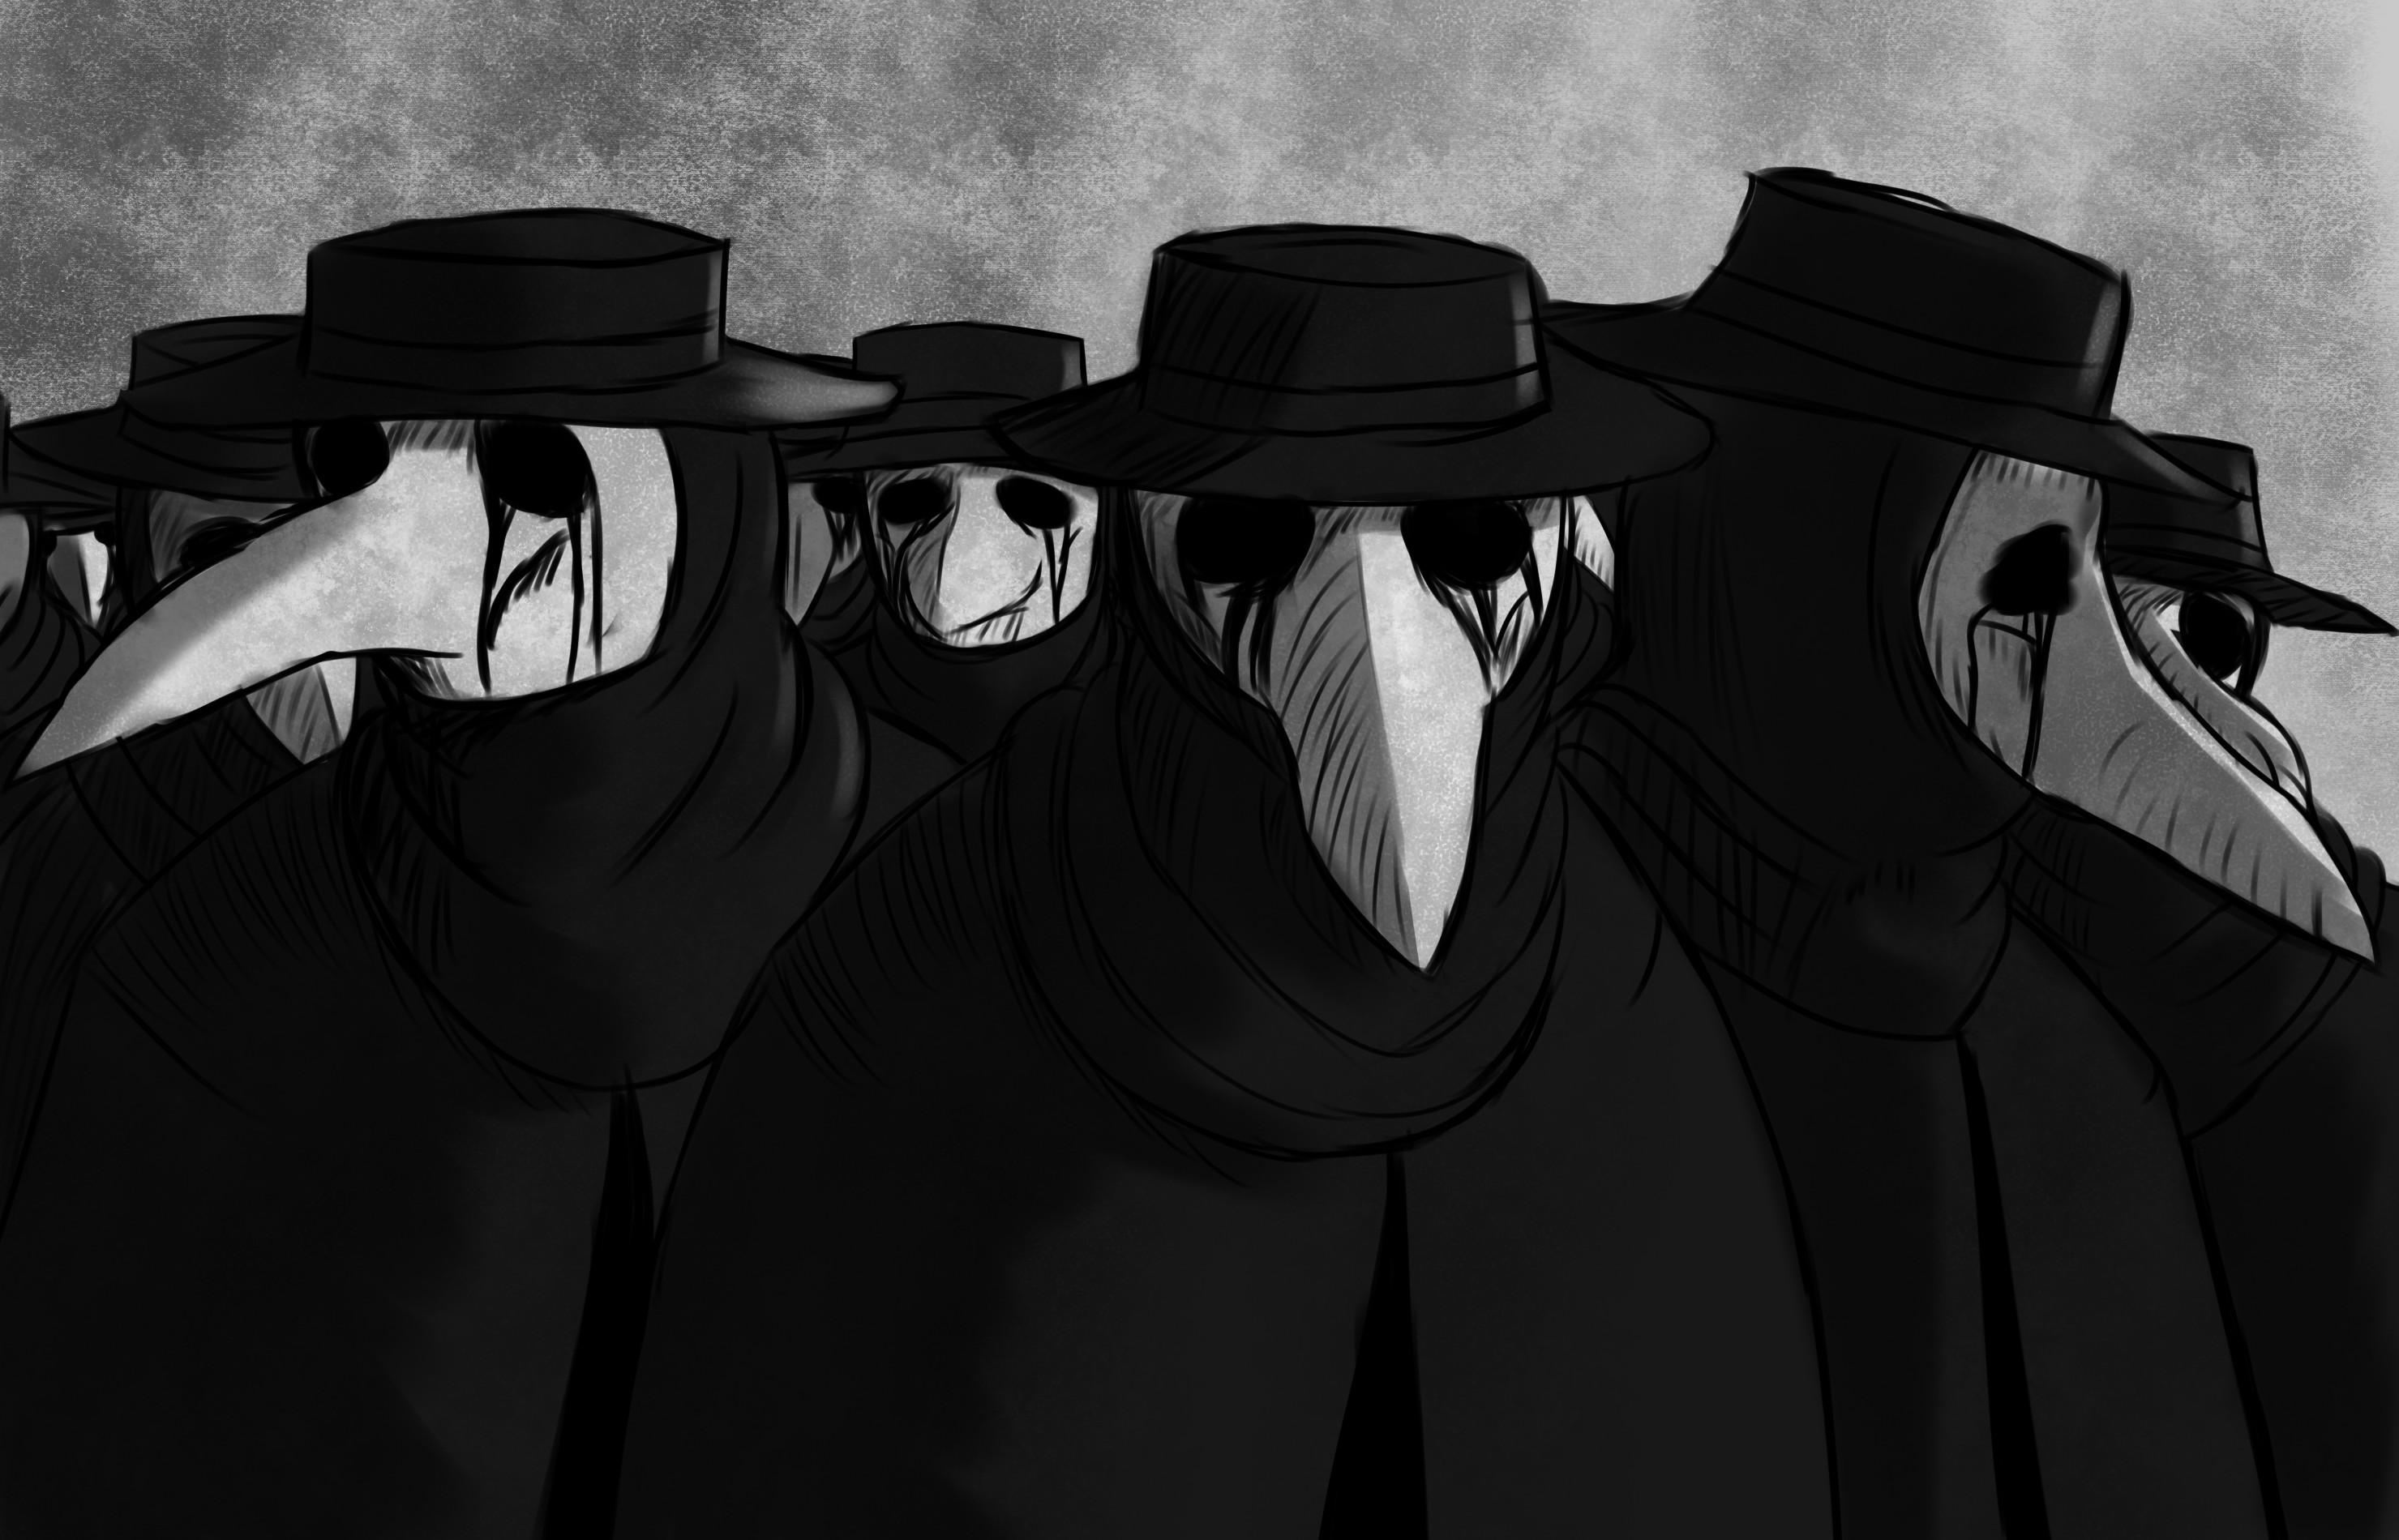 Plague Doctors by ben13241 on DeviantArt